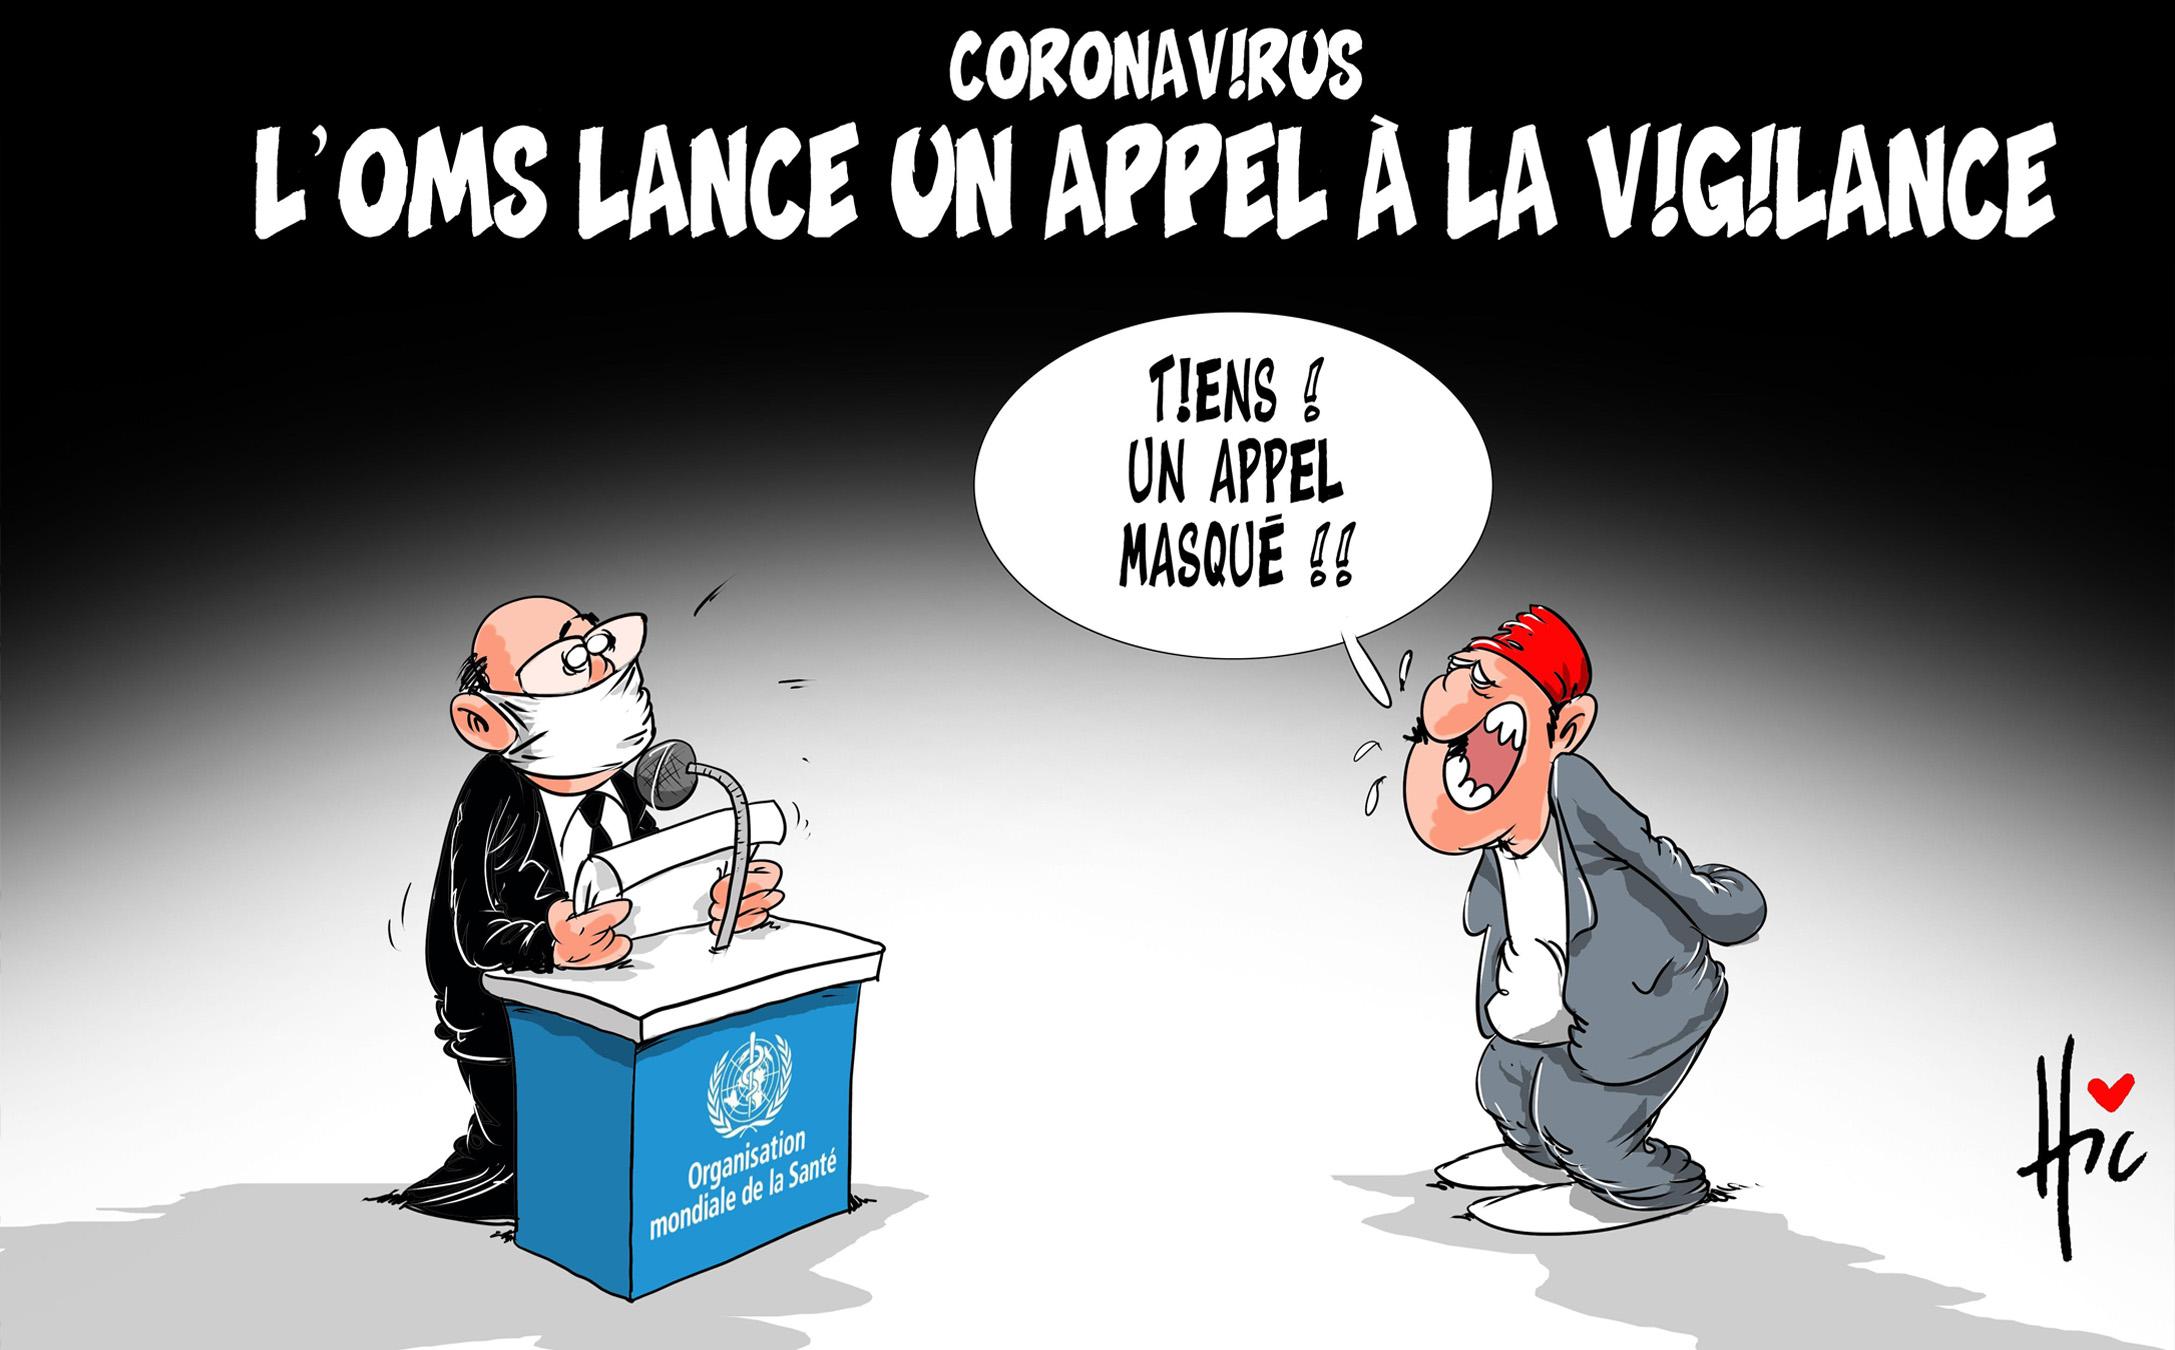 Coronavirus : L'OMS lance un appel à la vigilance - Dessins et Caricatures, Le Hic - El Watan - Gagdz.com